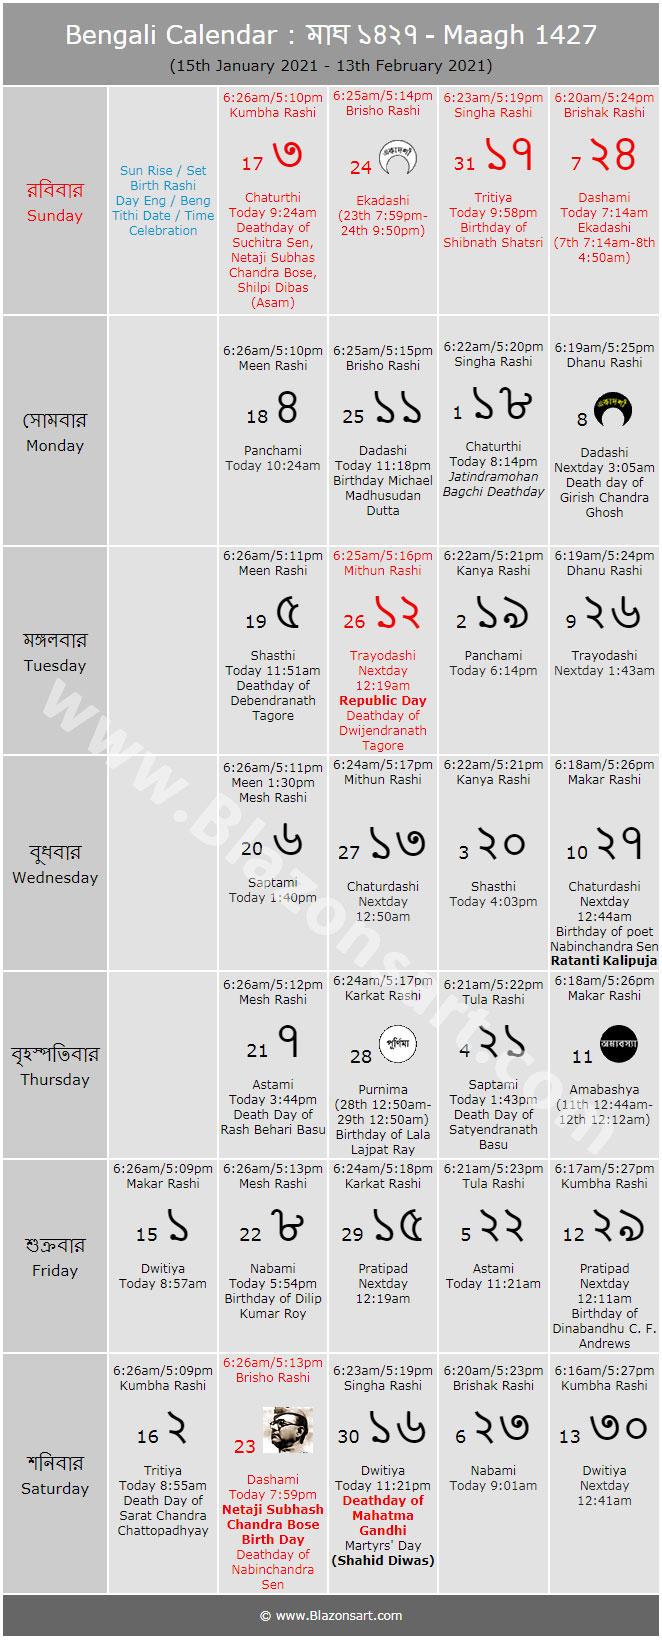 Bengali Calendar - Maagh 1427 : বাংলা intended for Sunday To Saturday Year Calendar 2021/21